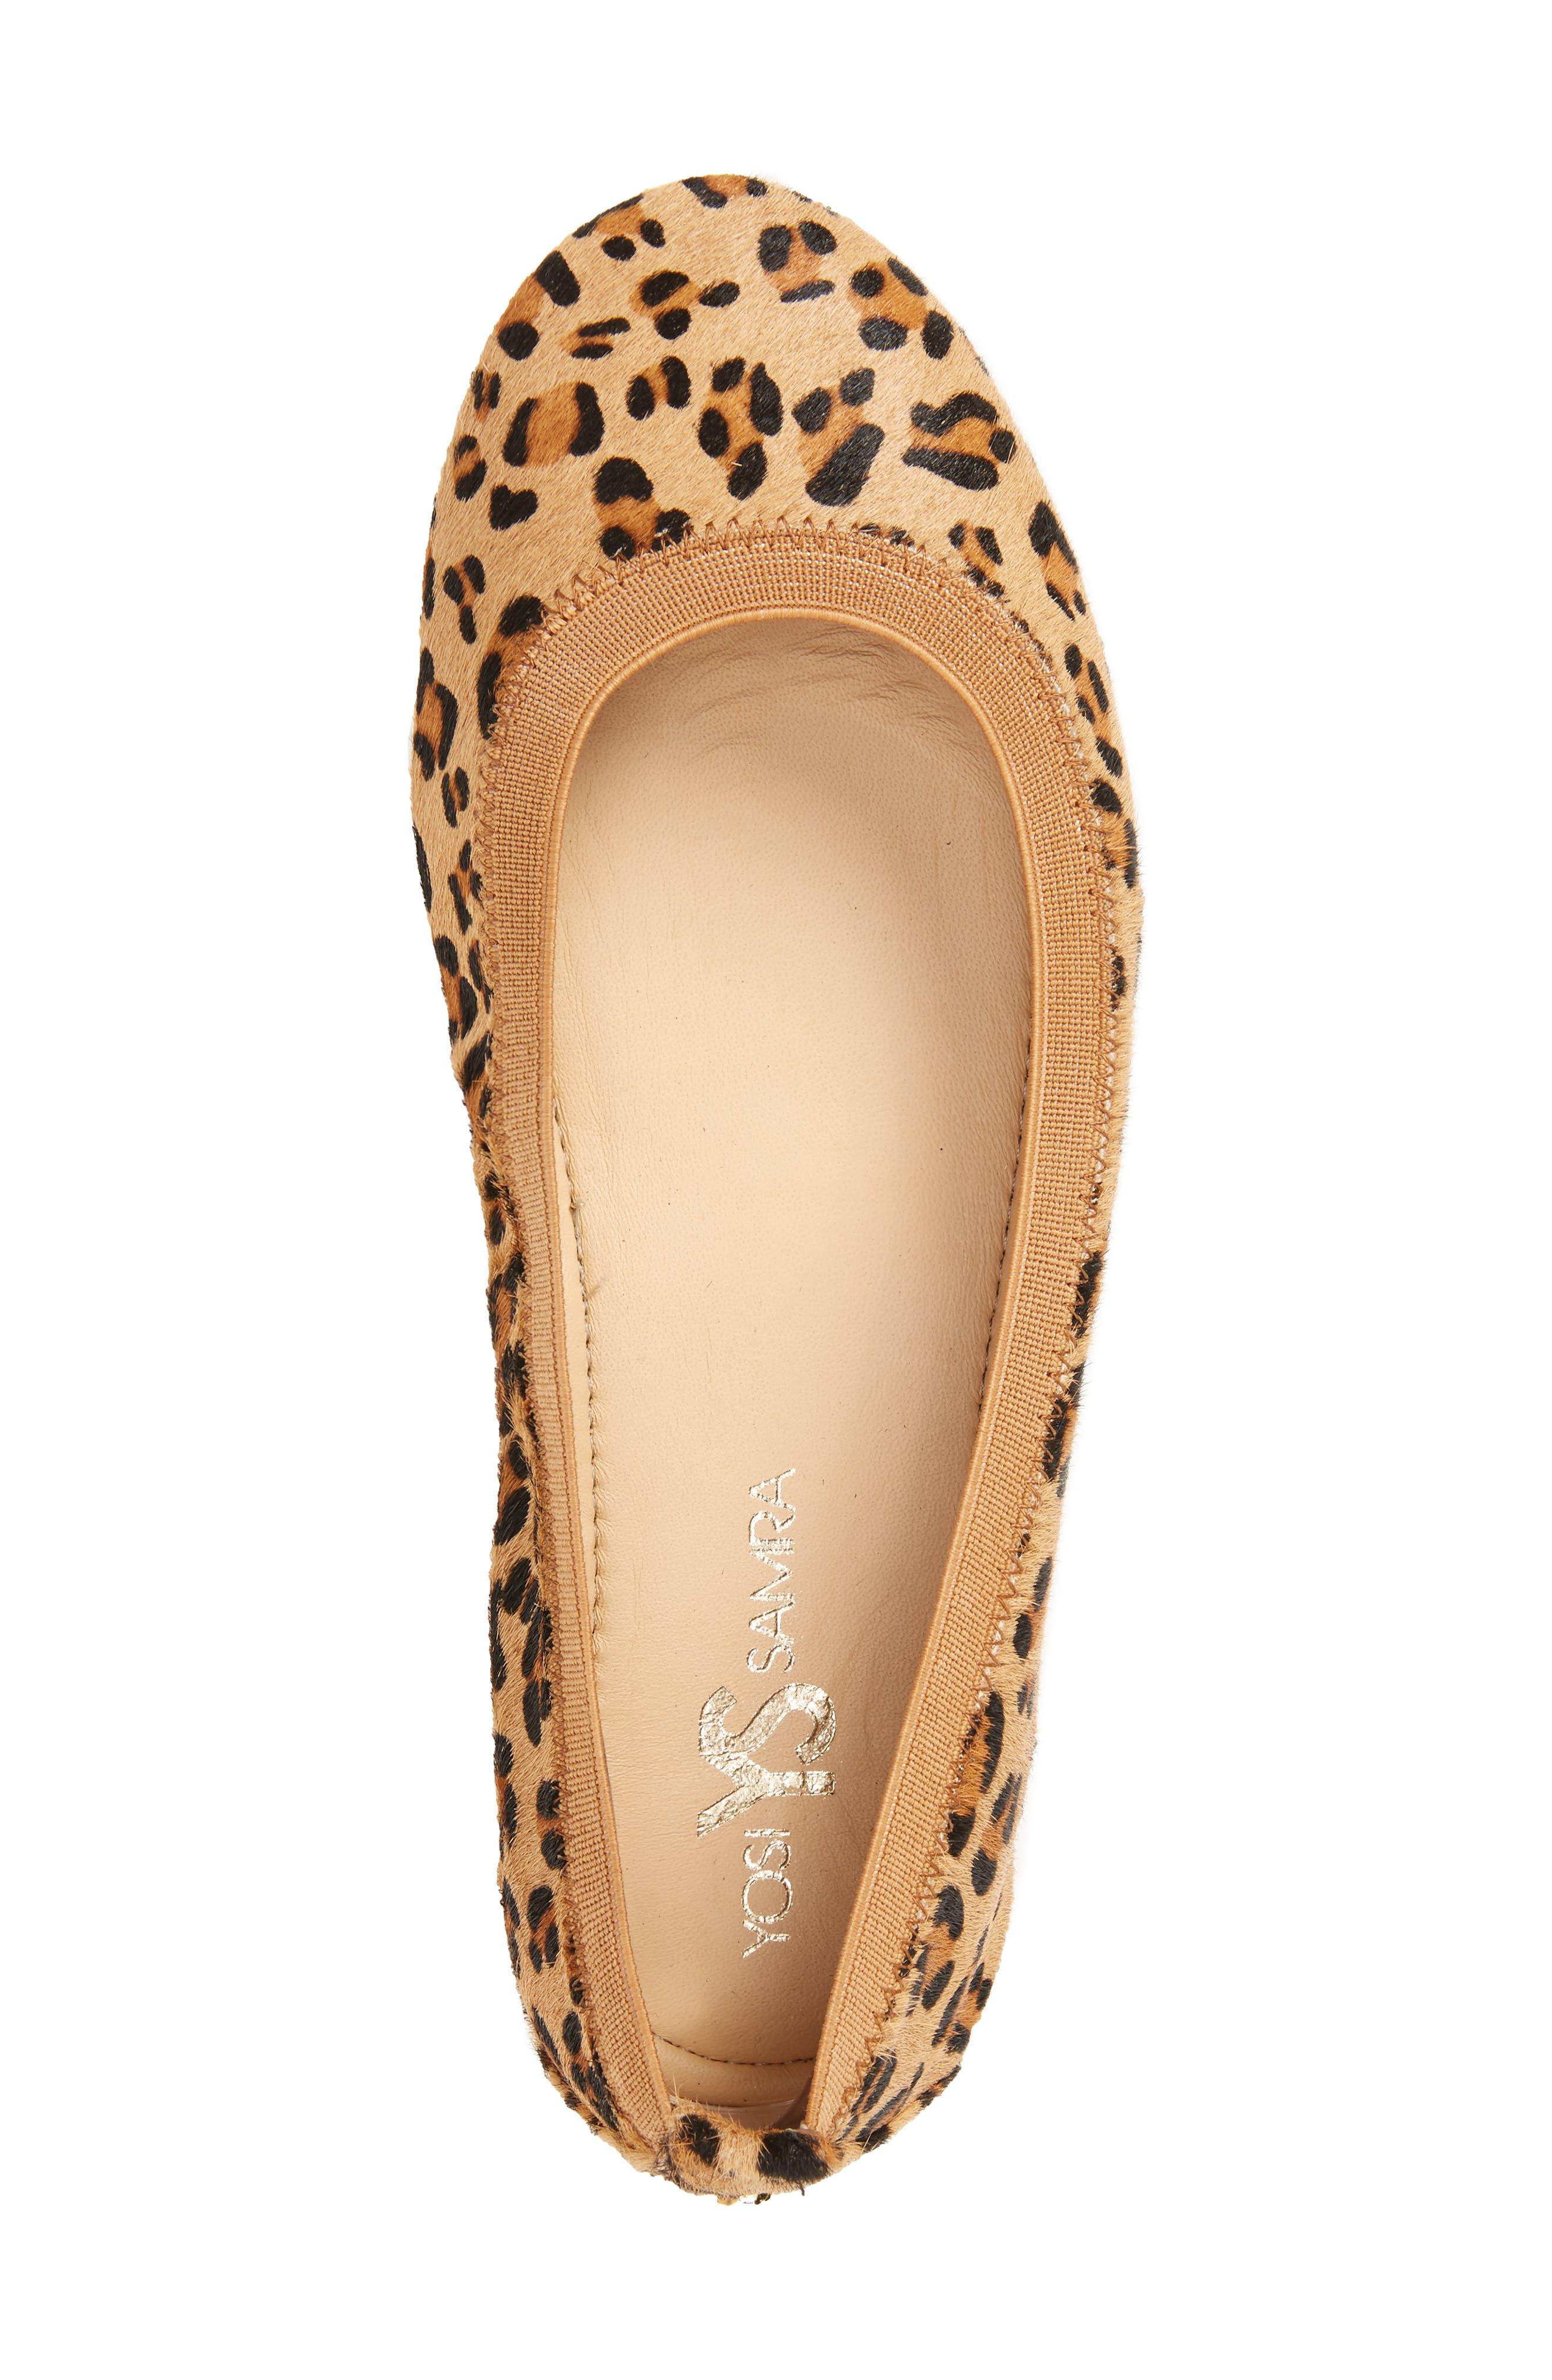 Samara 2.0 Foldable Ballet Flat,                             Alternate thumbnail 3, color,                             Natural Leopard Calf Hair